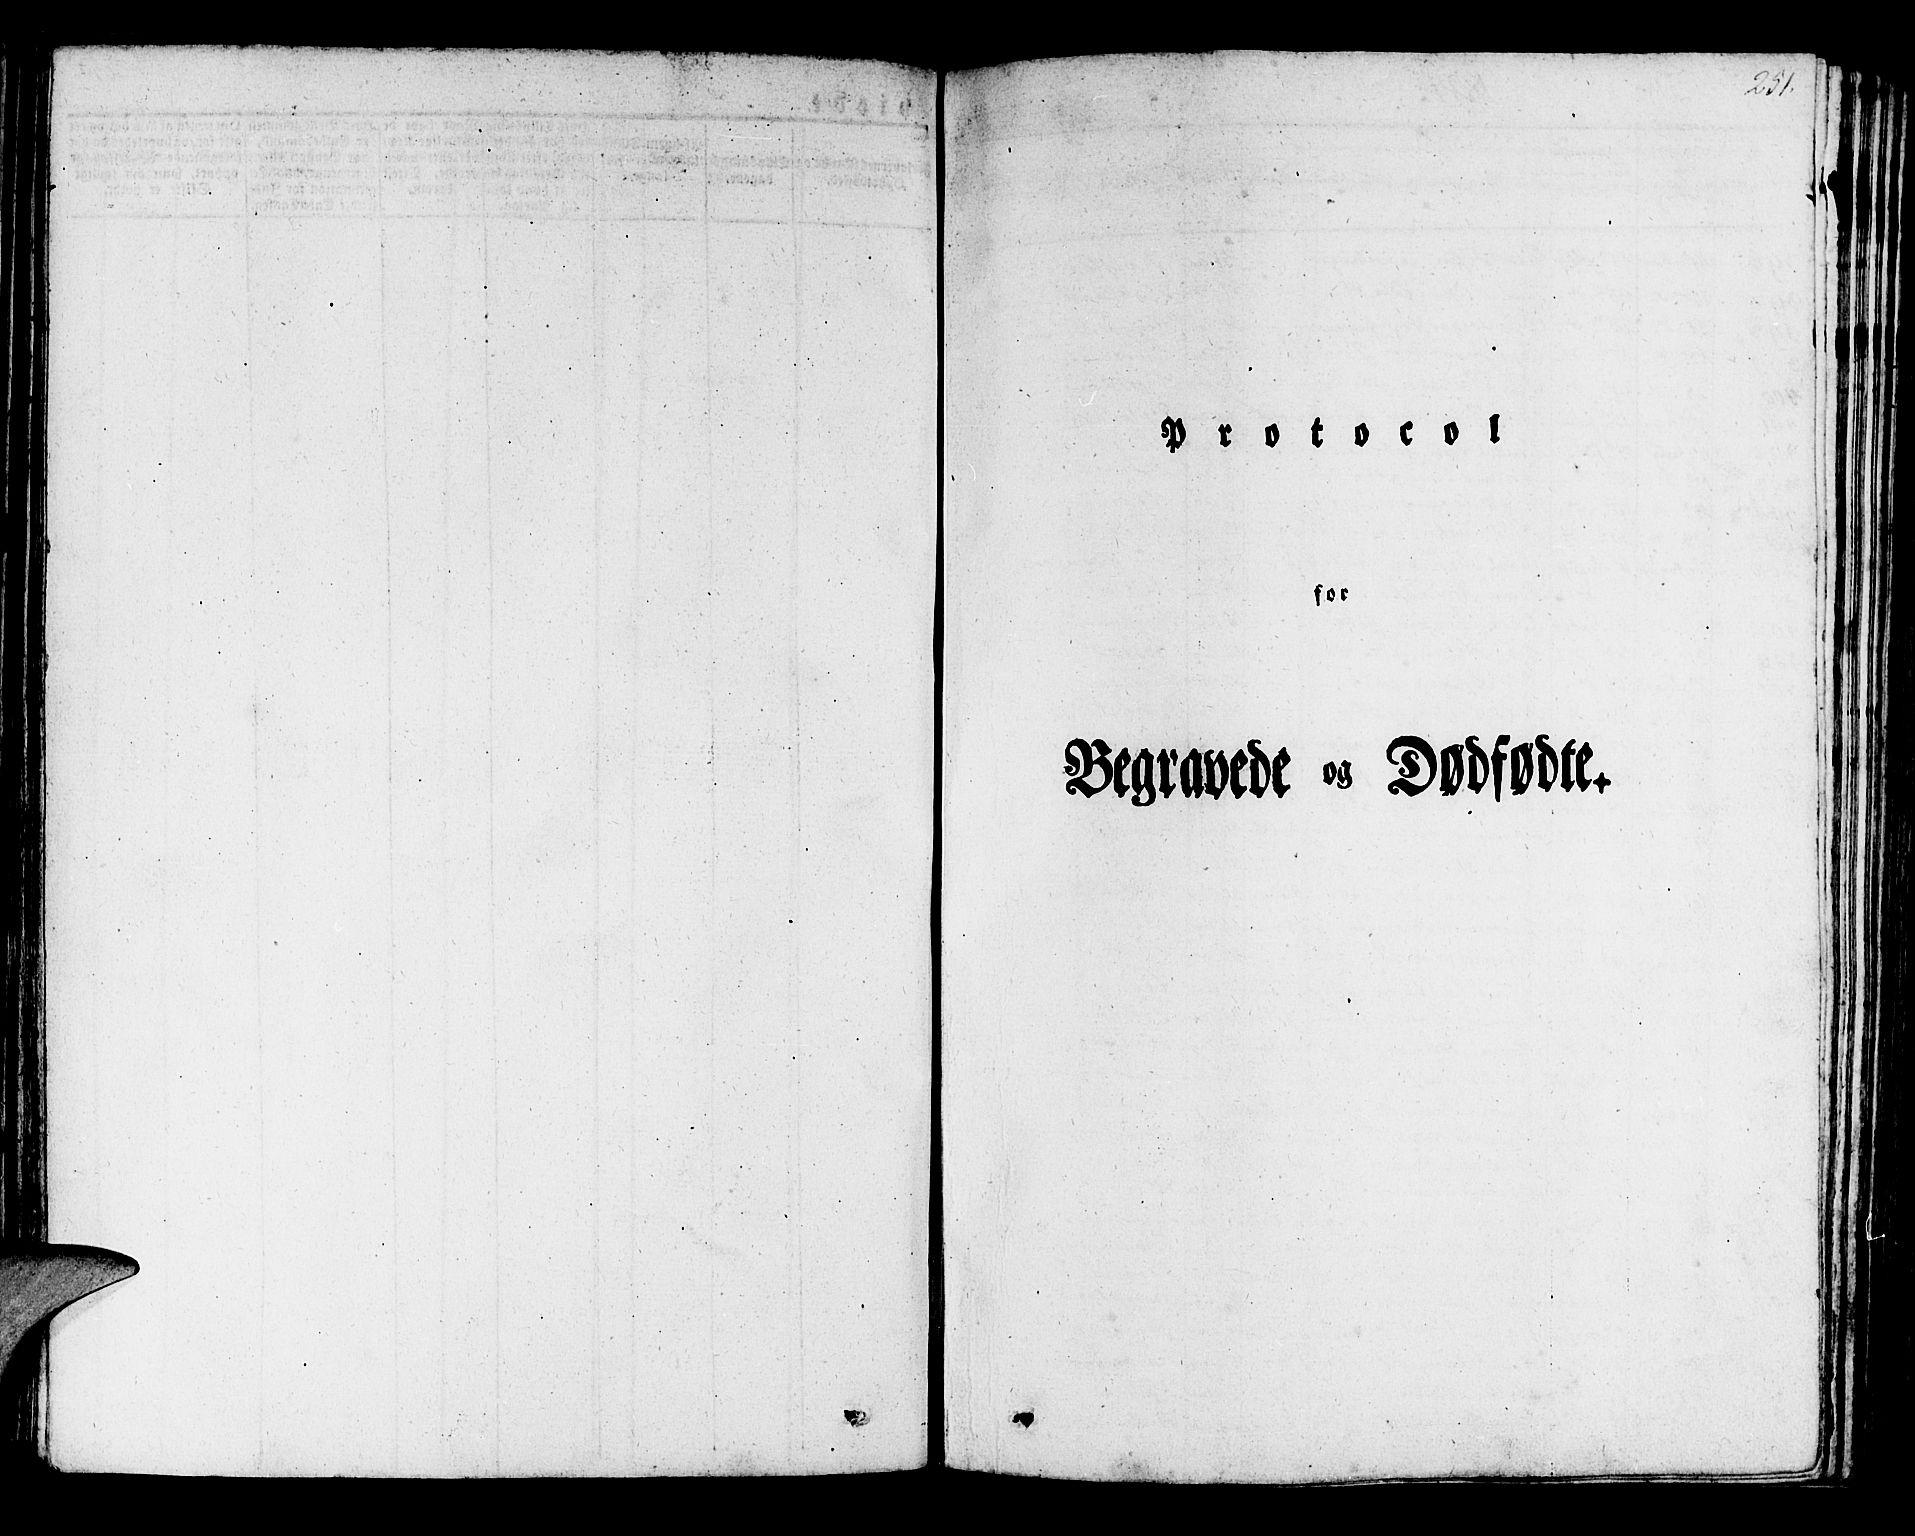 SAB, Manger sokneprestembete, H/Haa: Ministerialbok nr. A 4, 1824-1838, s. 251